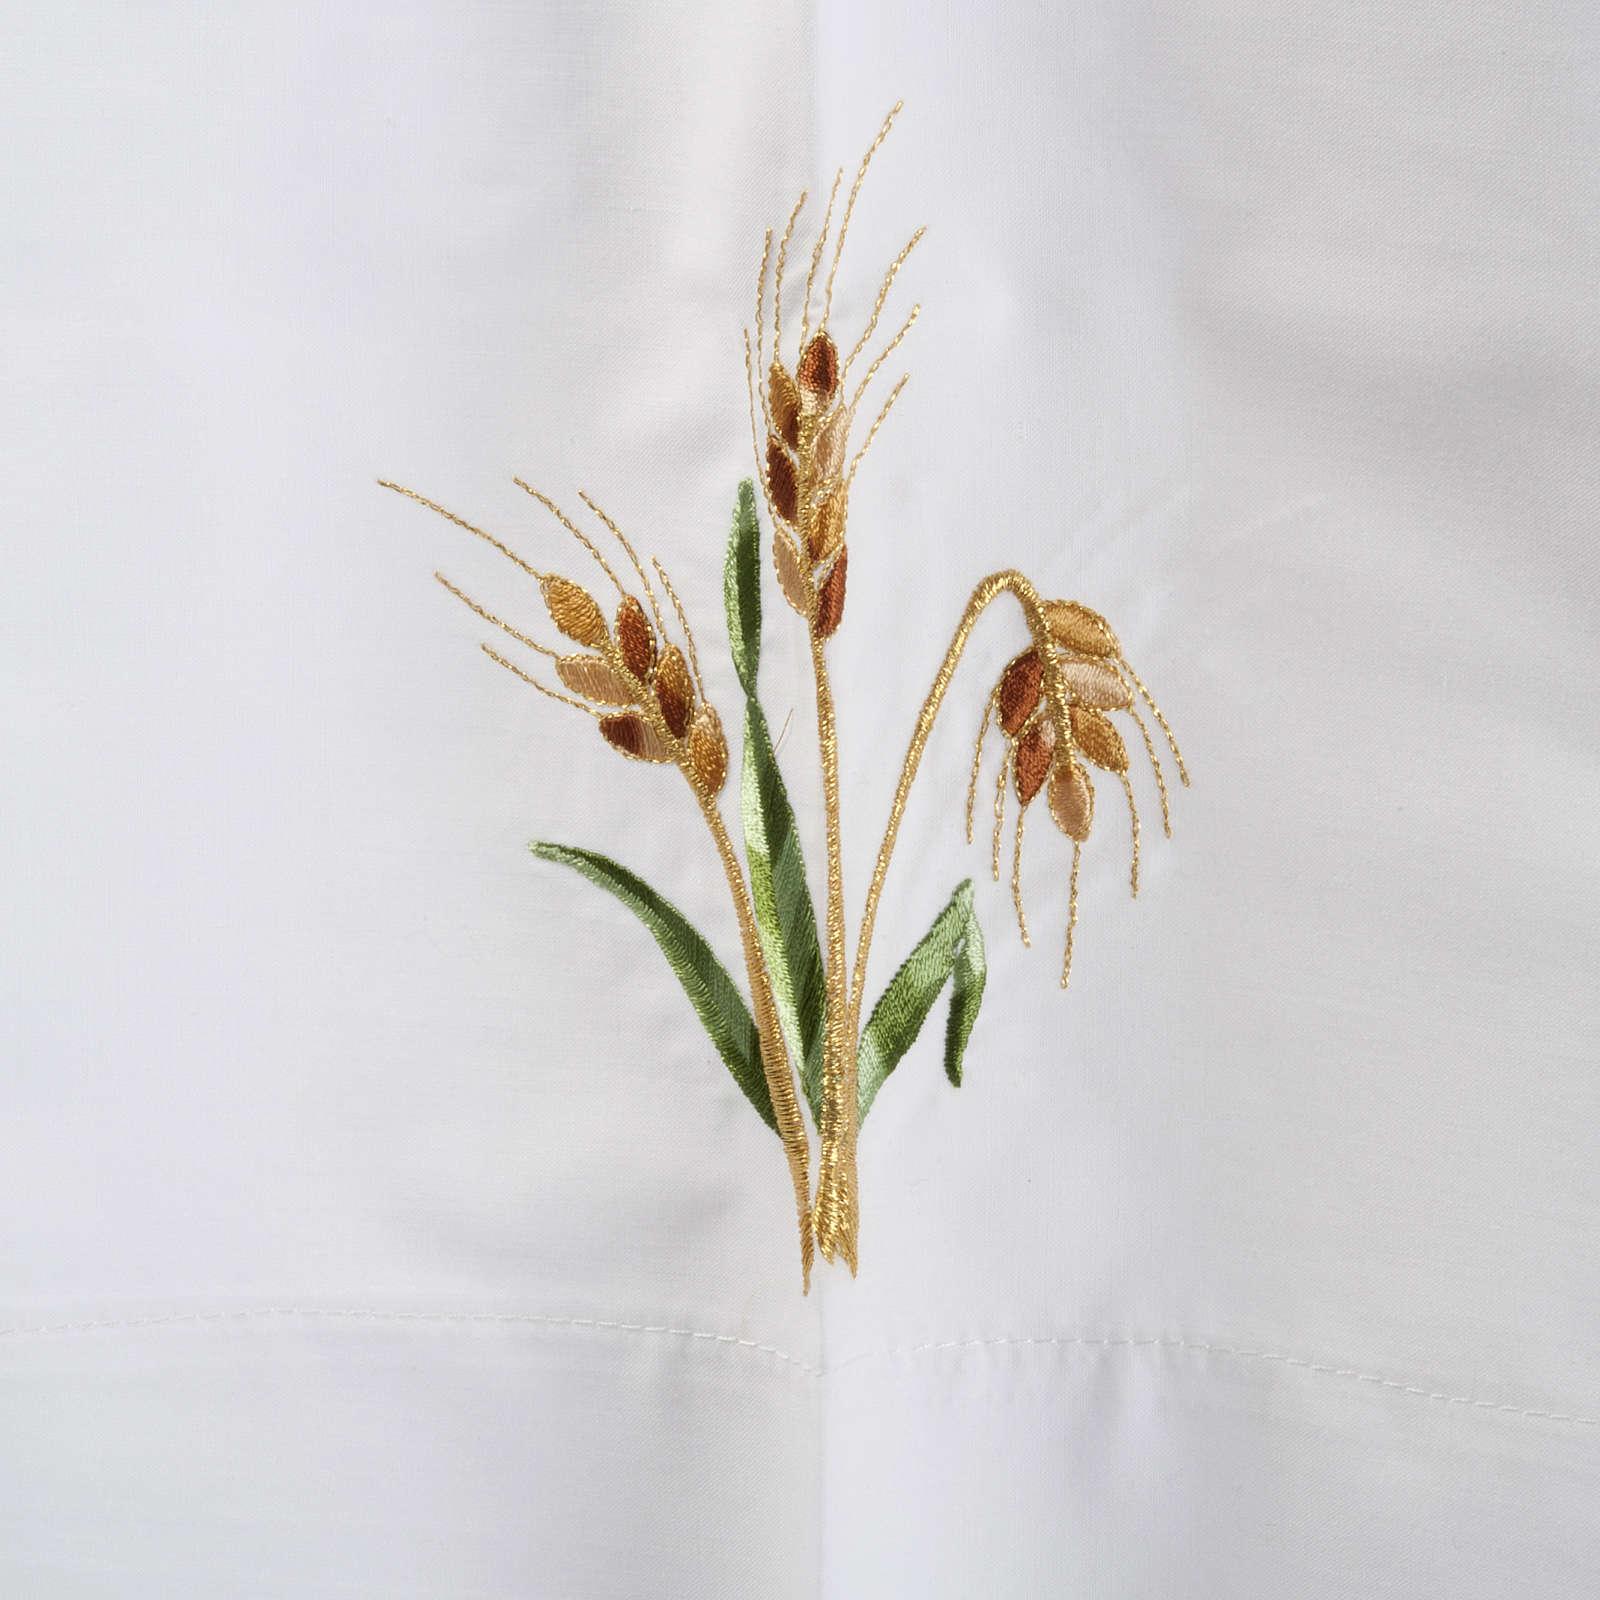 White alb in wool, paten, grapes, ears of wheat 4